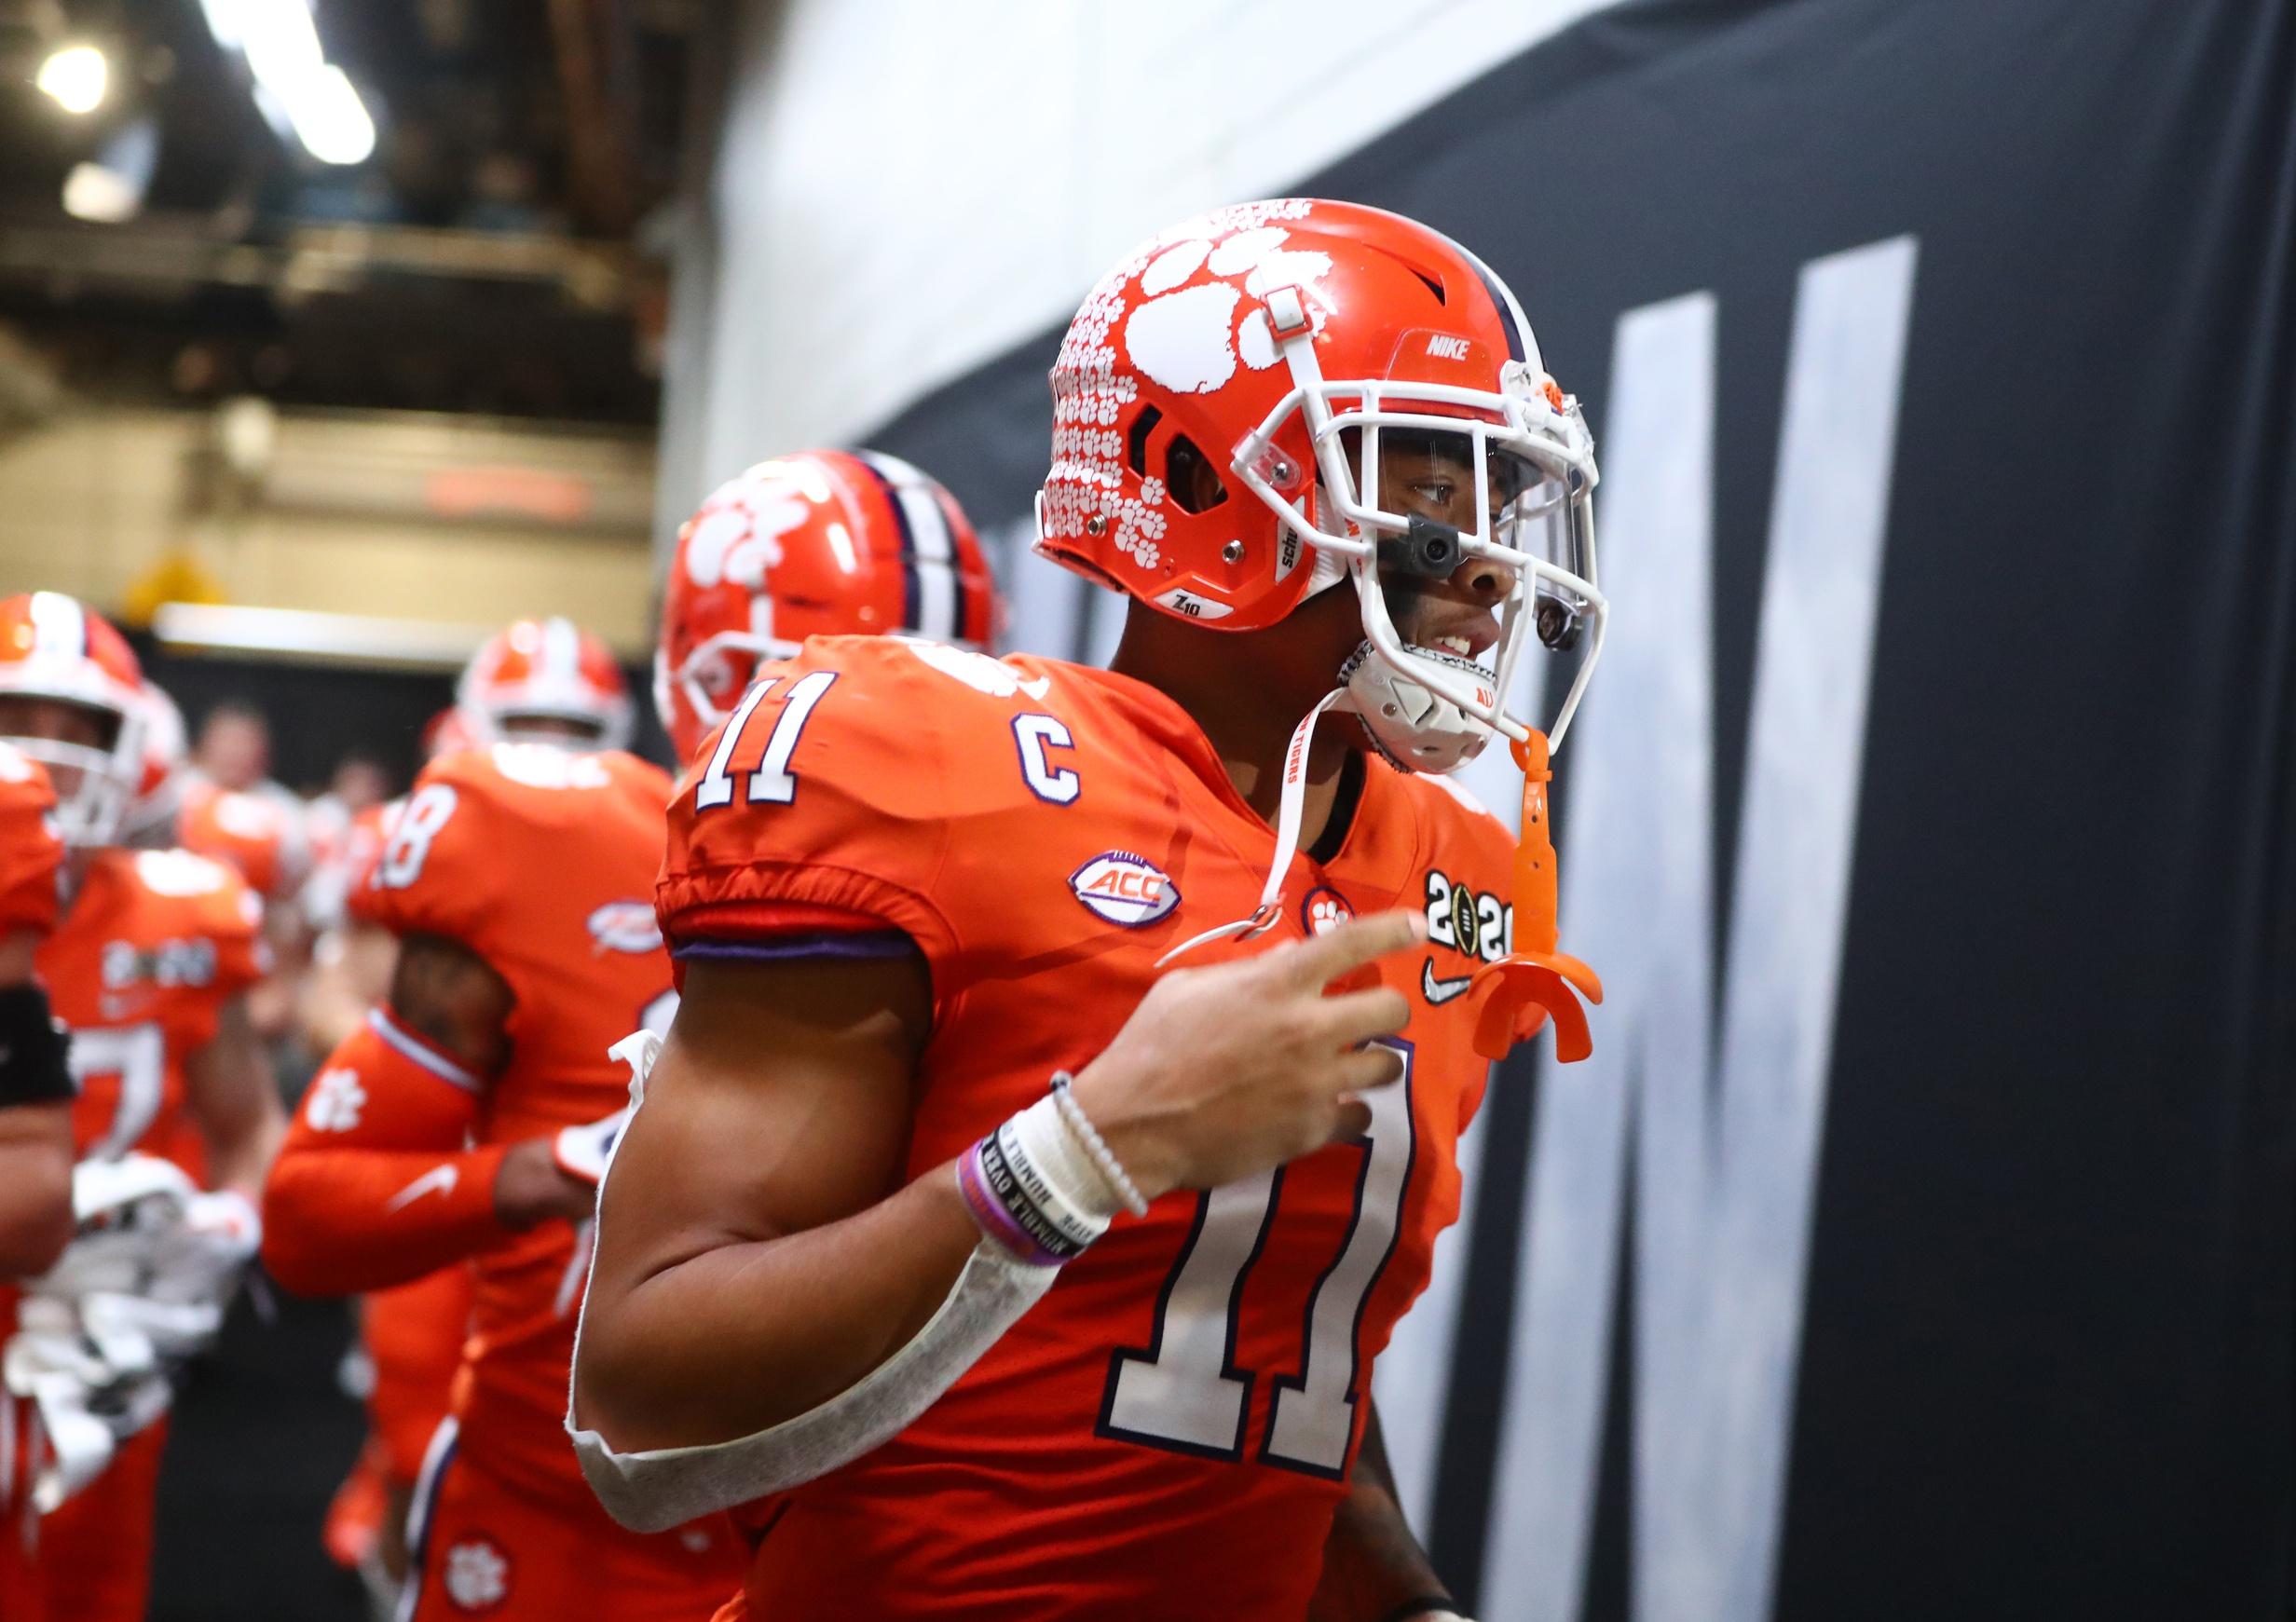 Draft Prospect Preview | LB Isaiah Simmons, Clemson